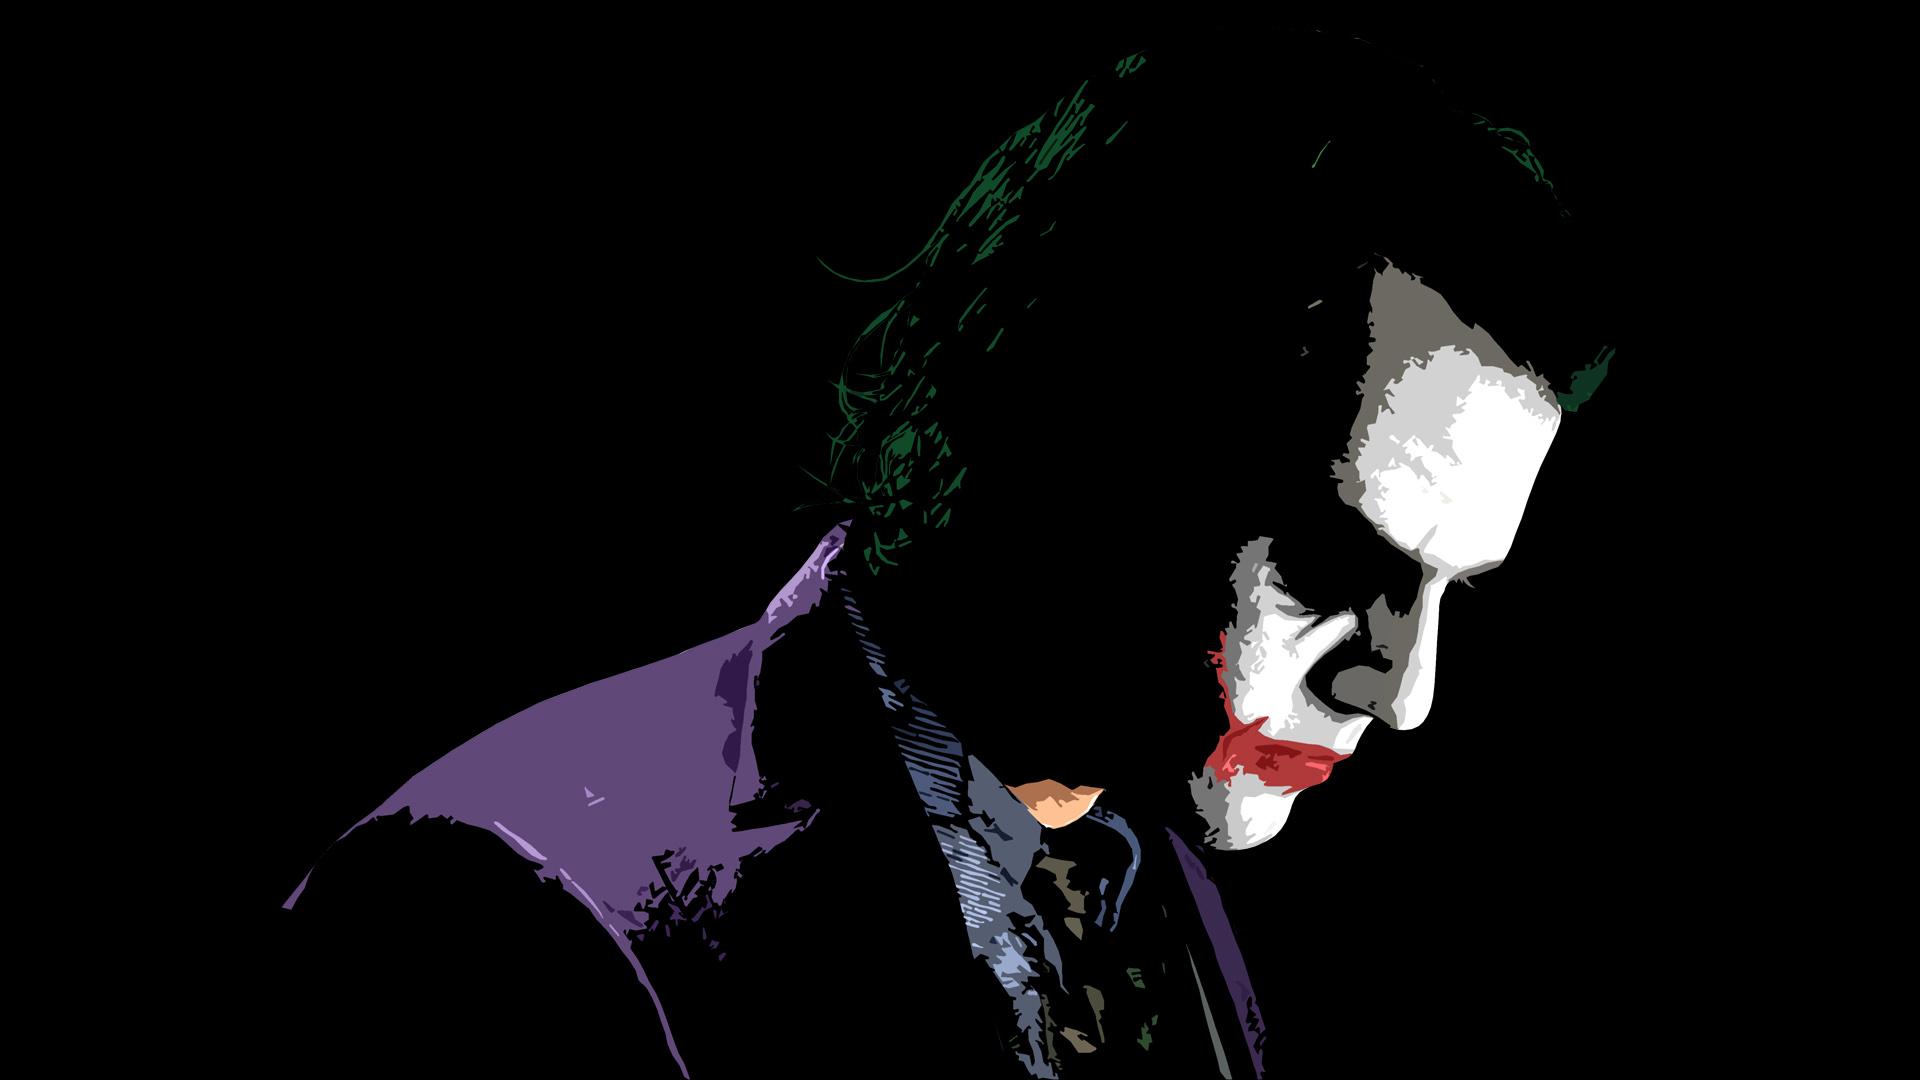 Wallpapers del Joker   Taringa 1920x1080